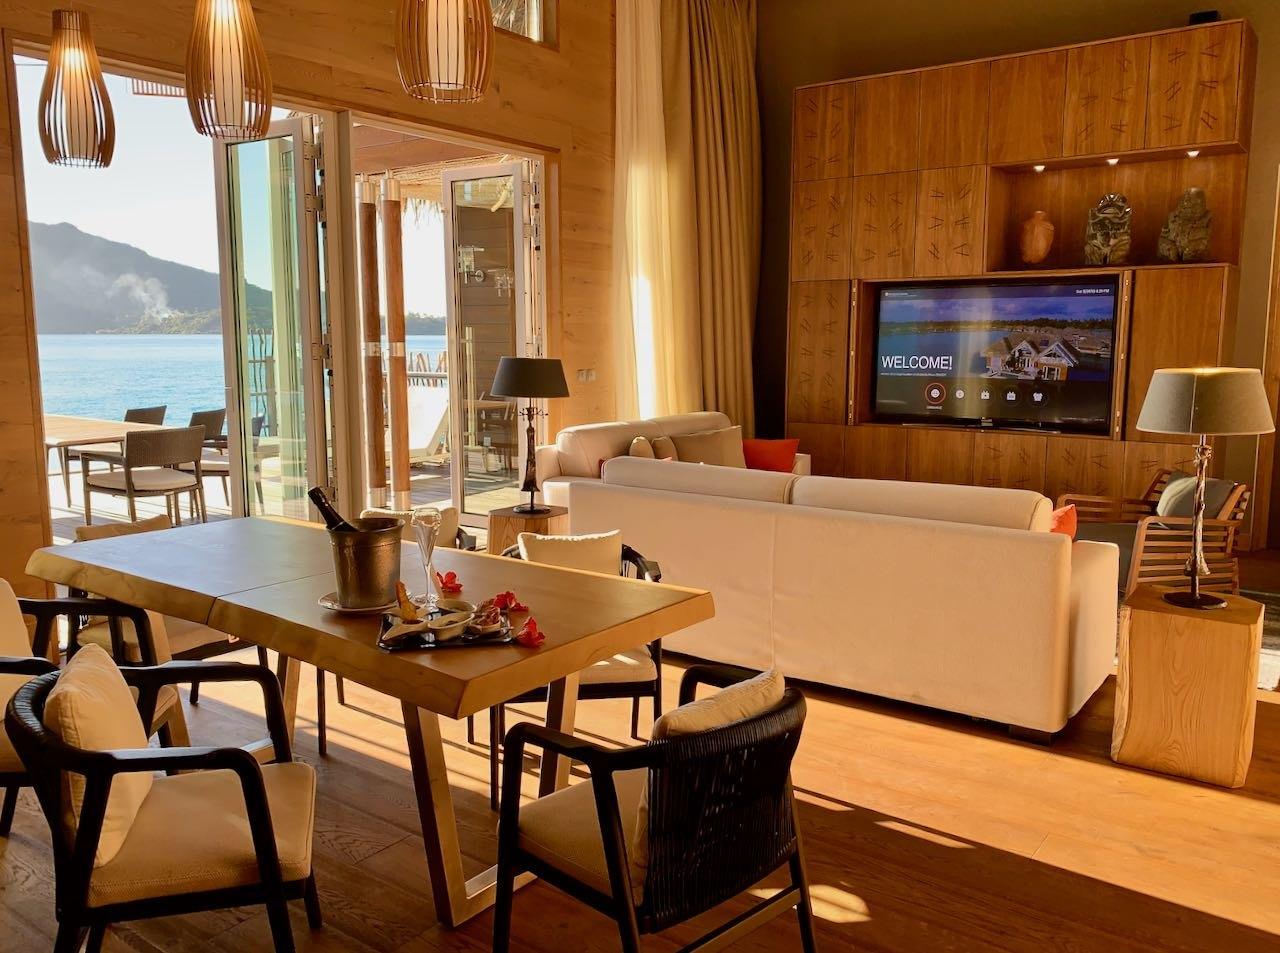 Living room and veranda The Brando Suite at the InterContinental Bora Bora Thalasso Review